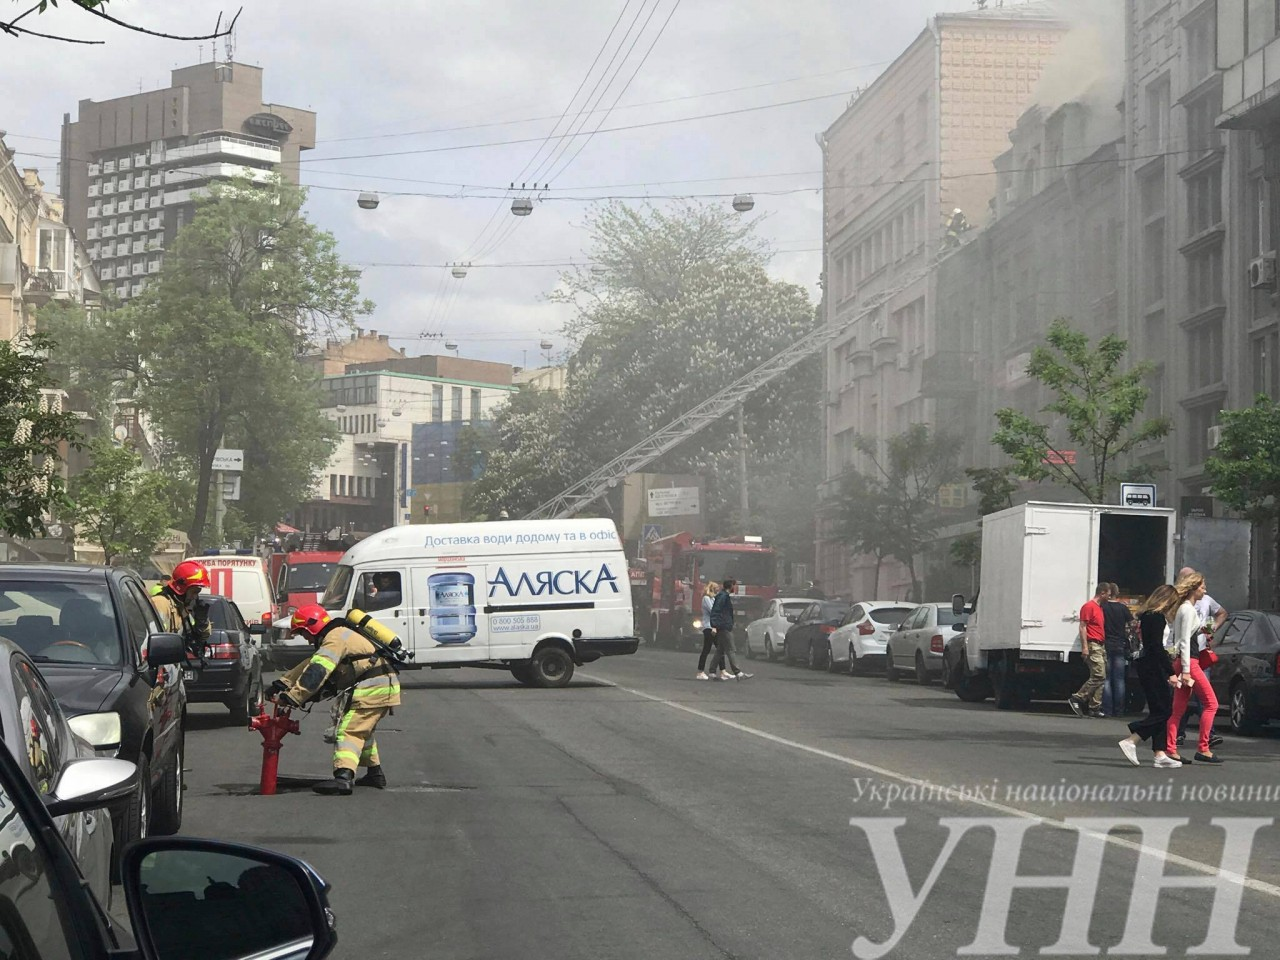 УКиєві сталася пожежа втриповерховому будинку наПетлюри